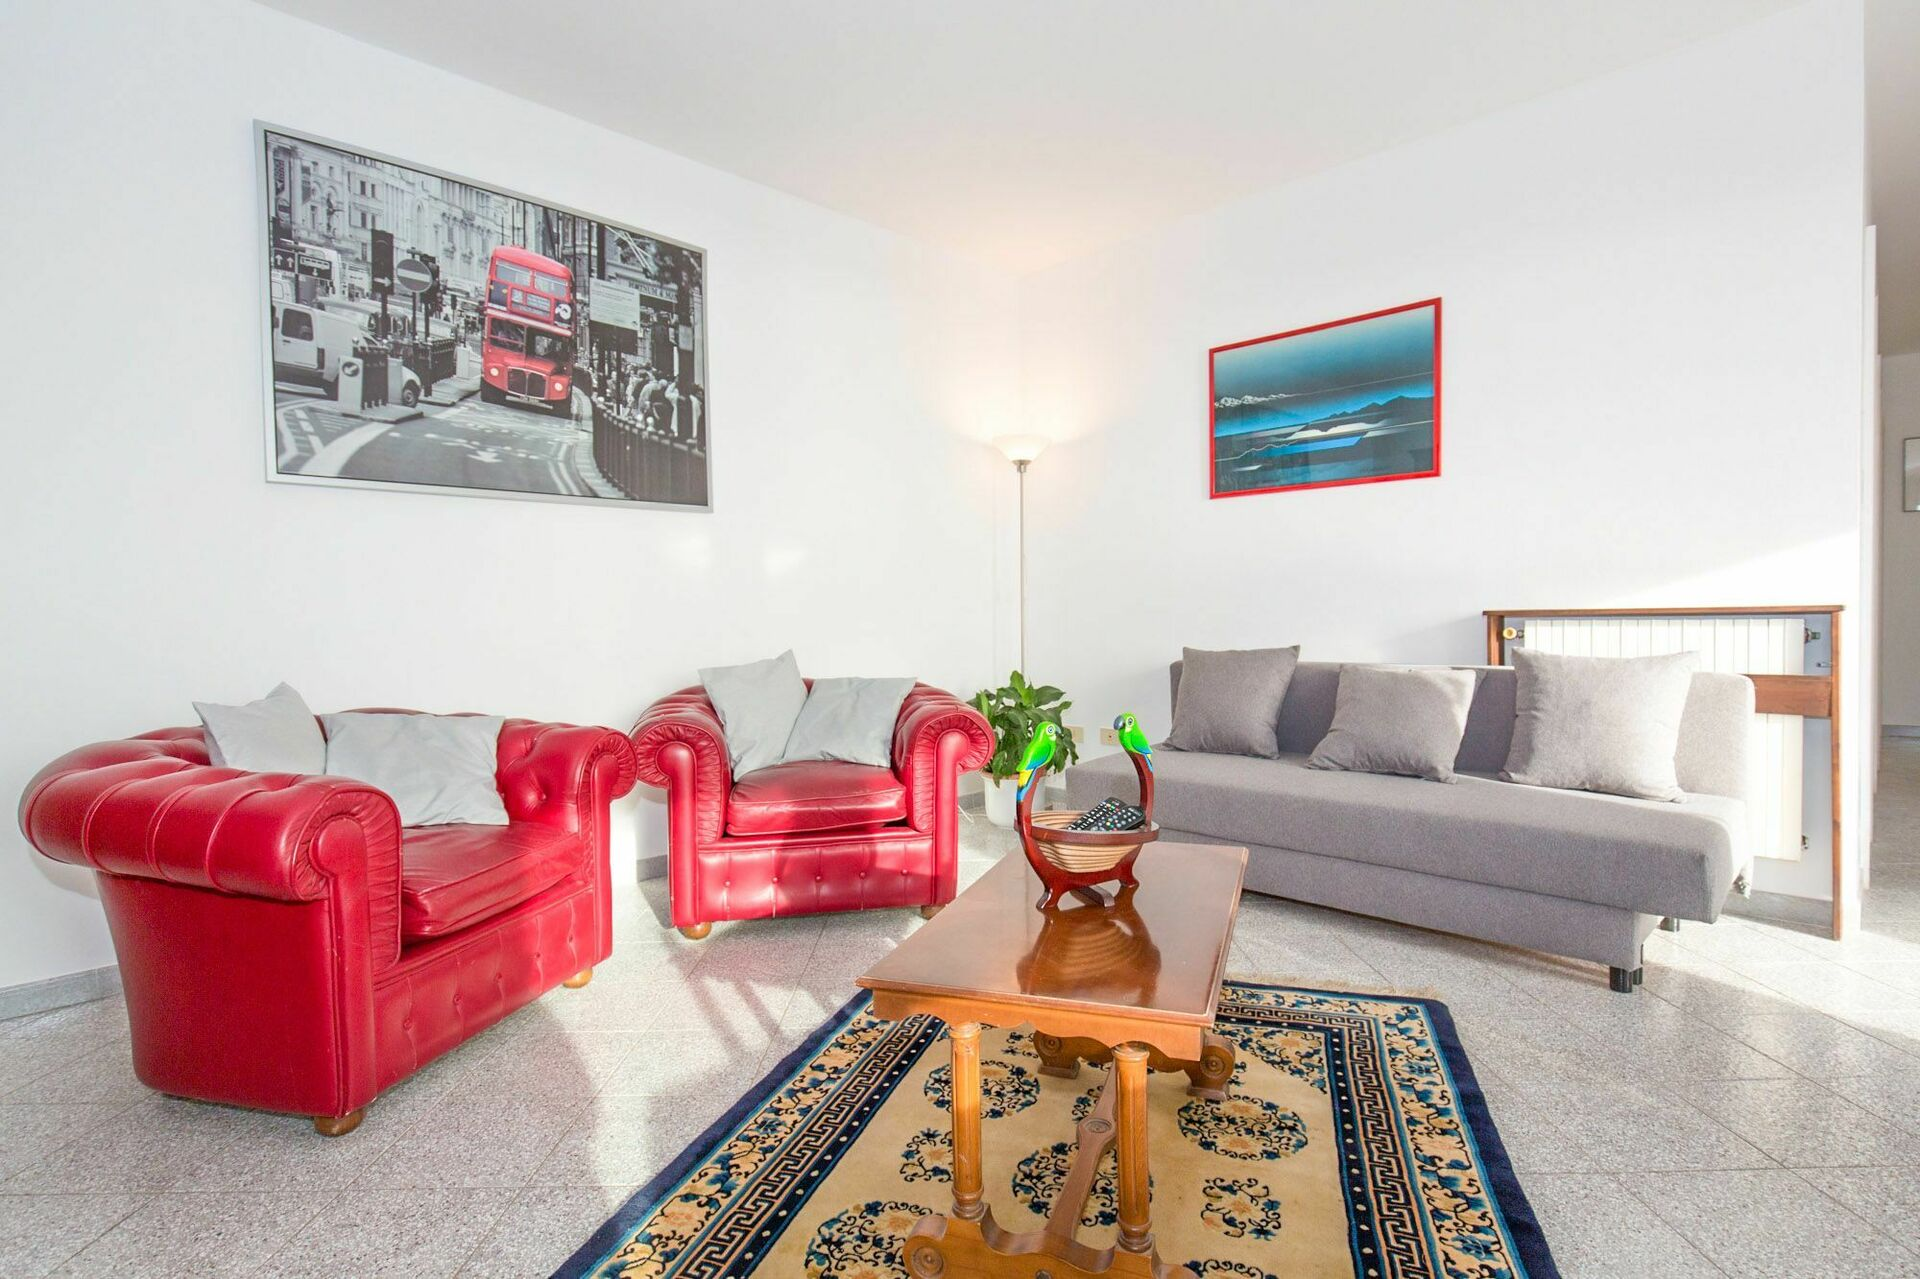 Casa vacanze a Piani Paorelli | Villa Bianca Costarainera ...